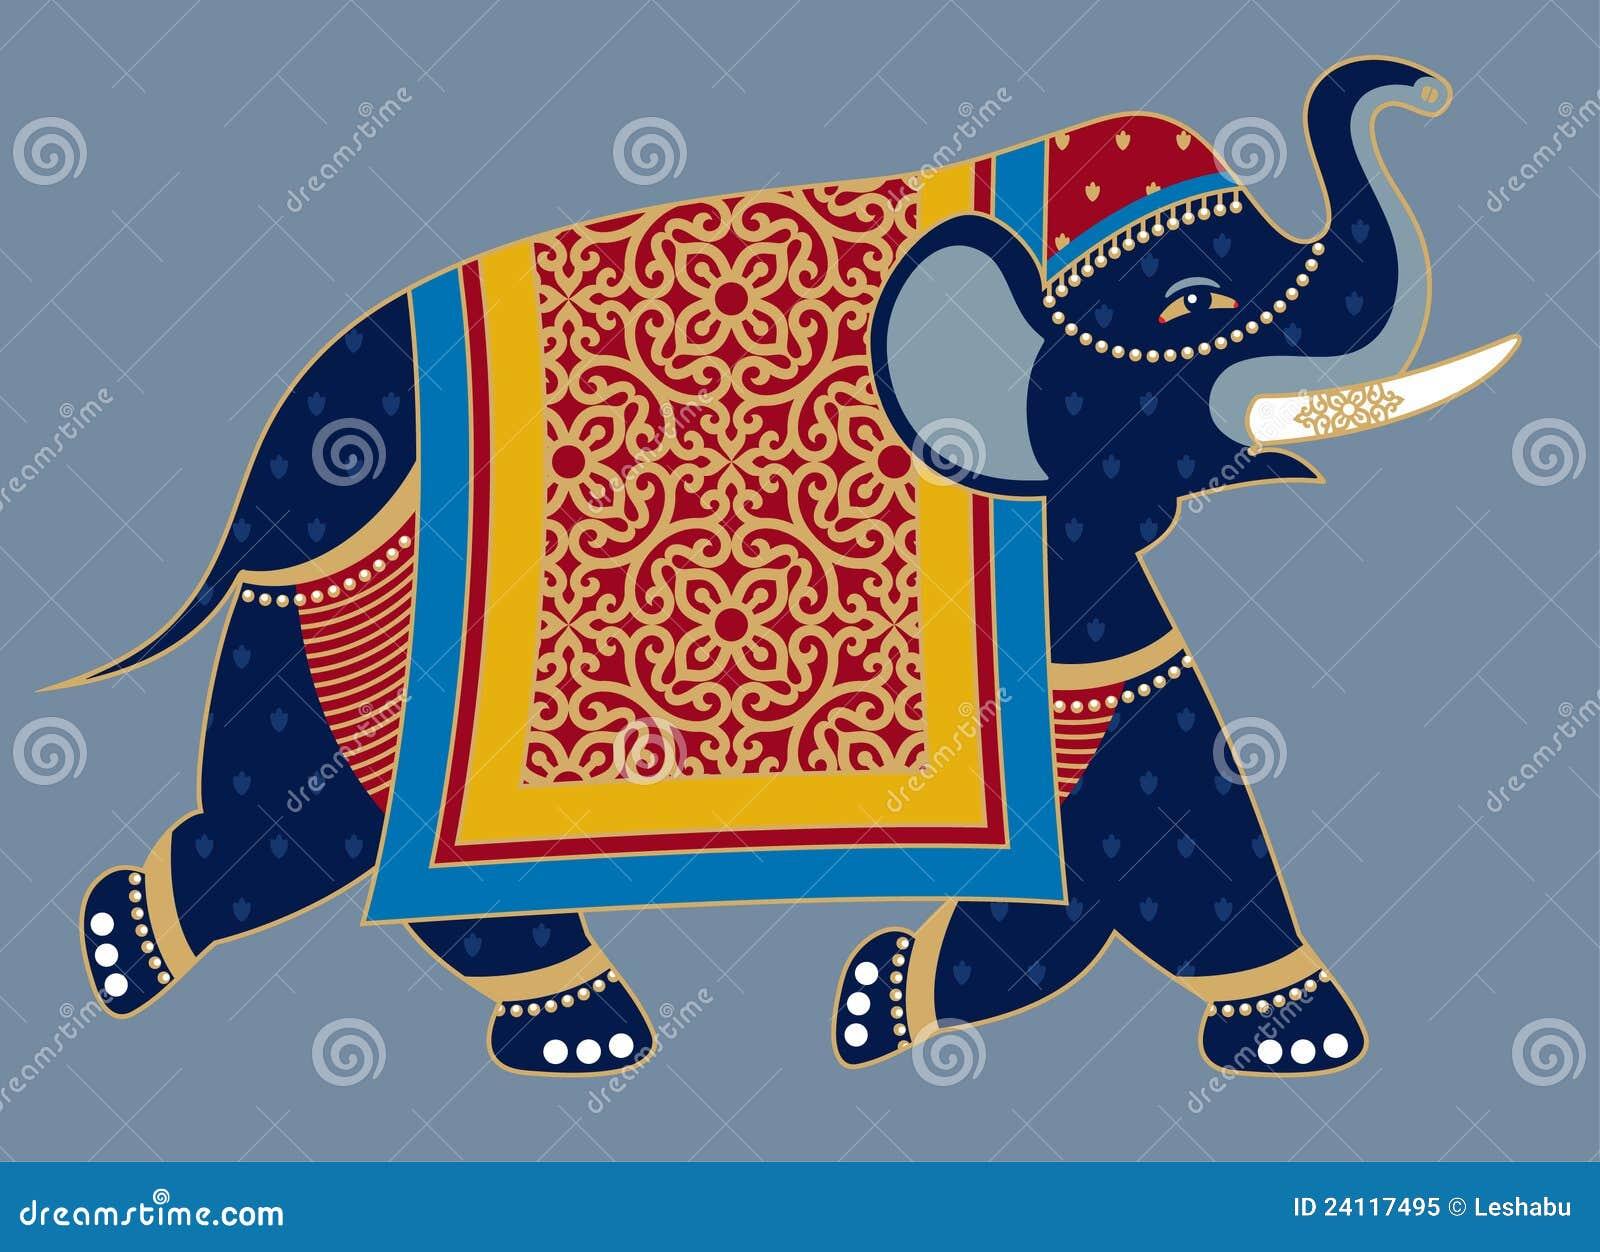 Indian Decorated Elephant Illustration Royalty Free Stock ...